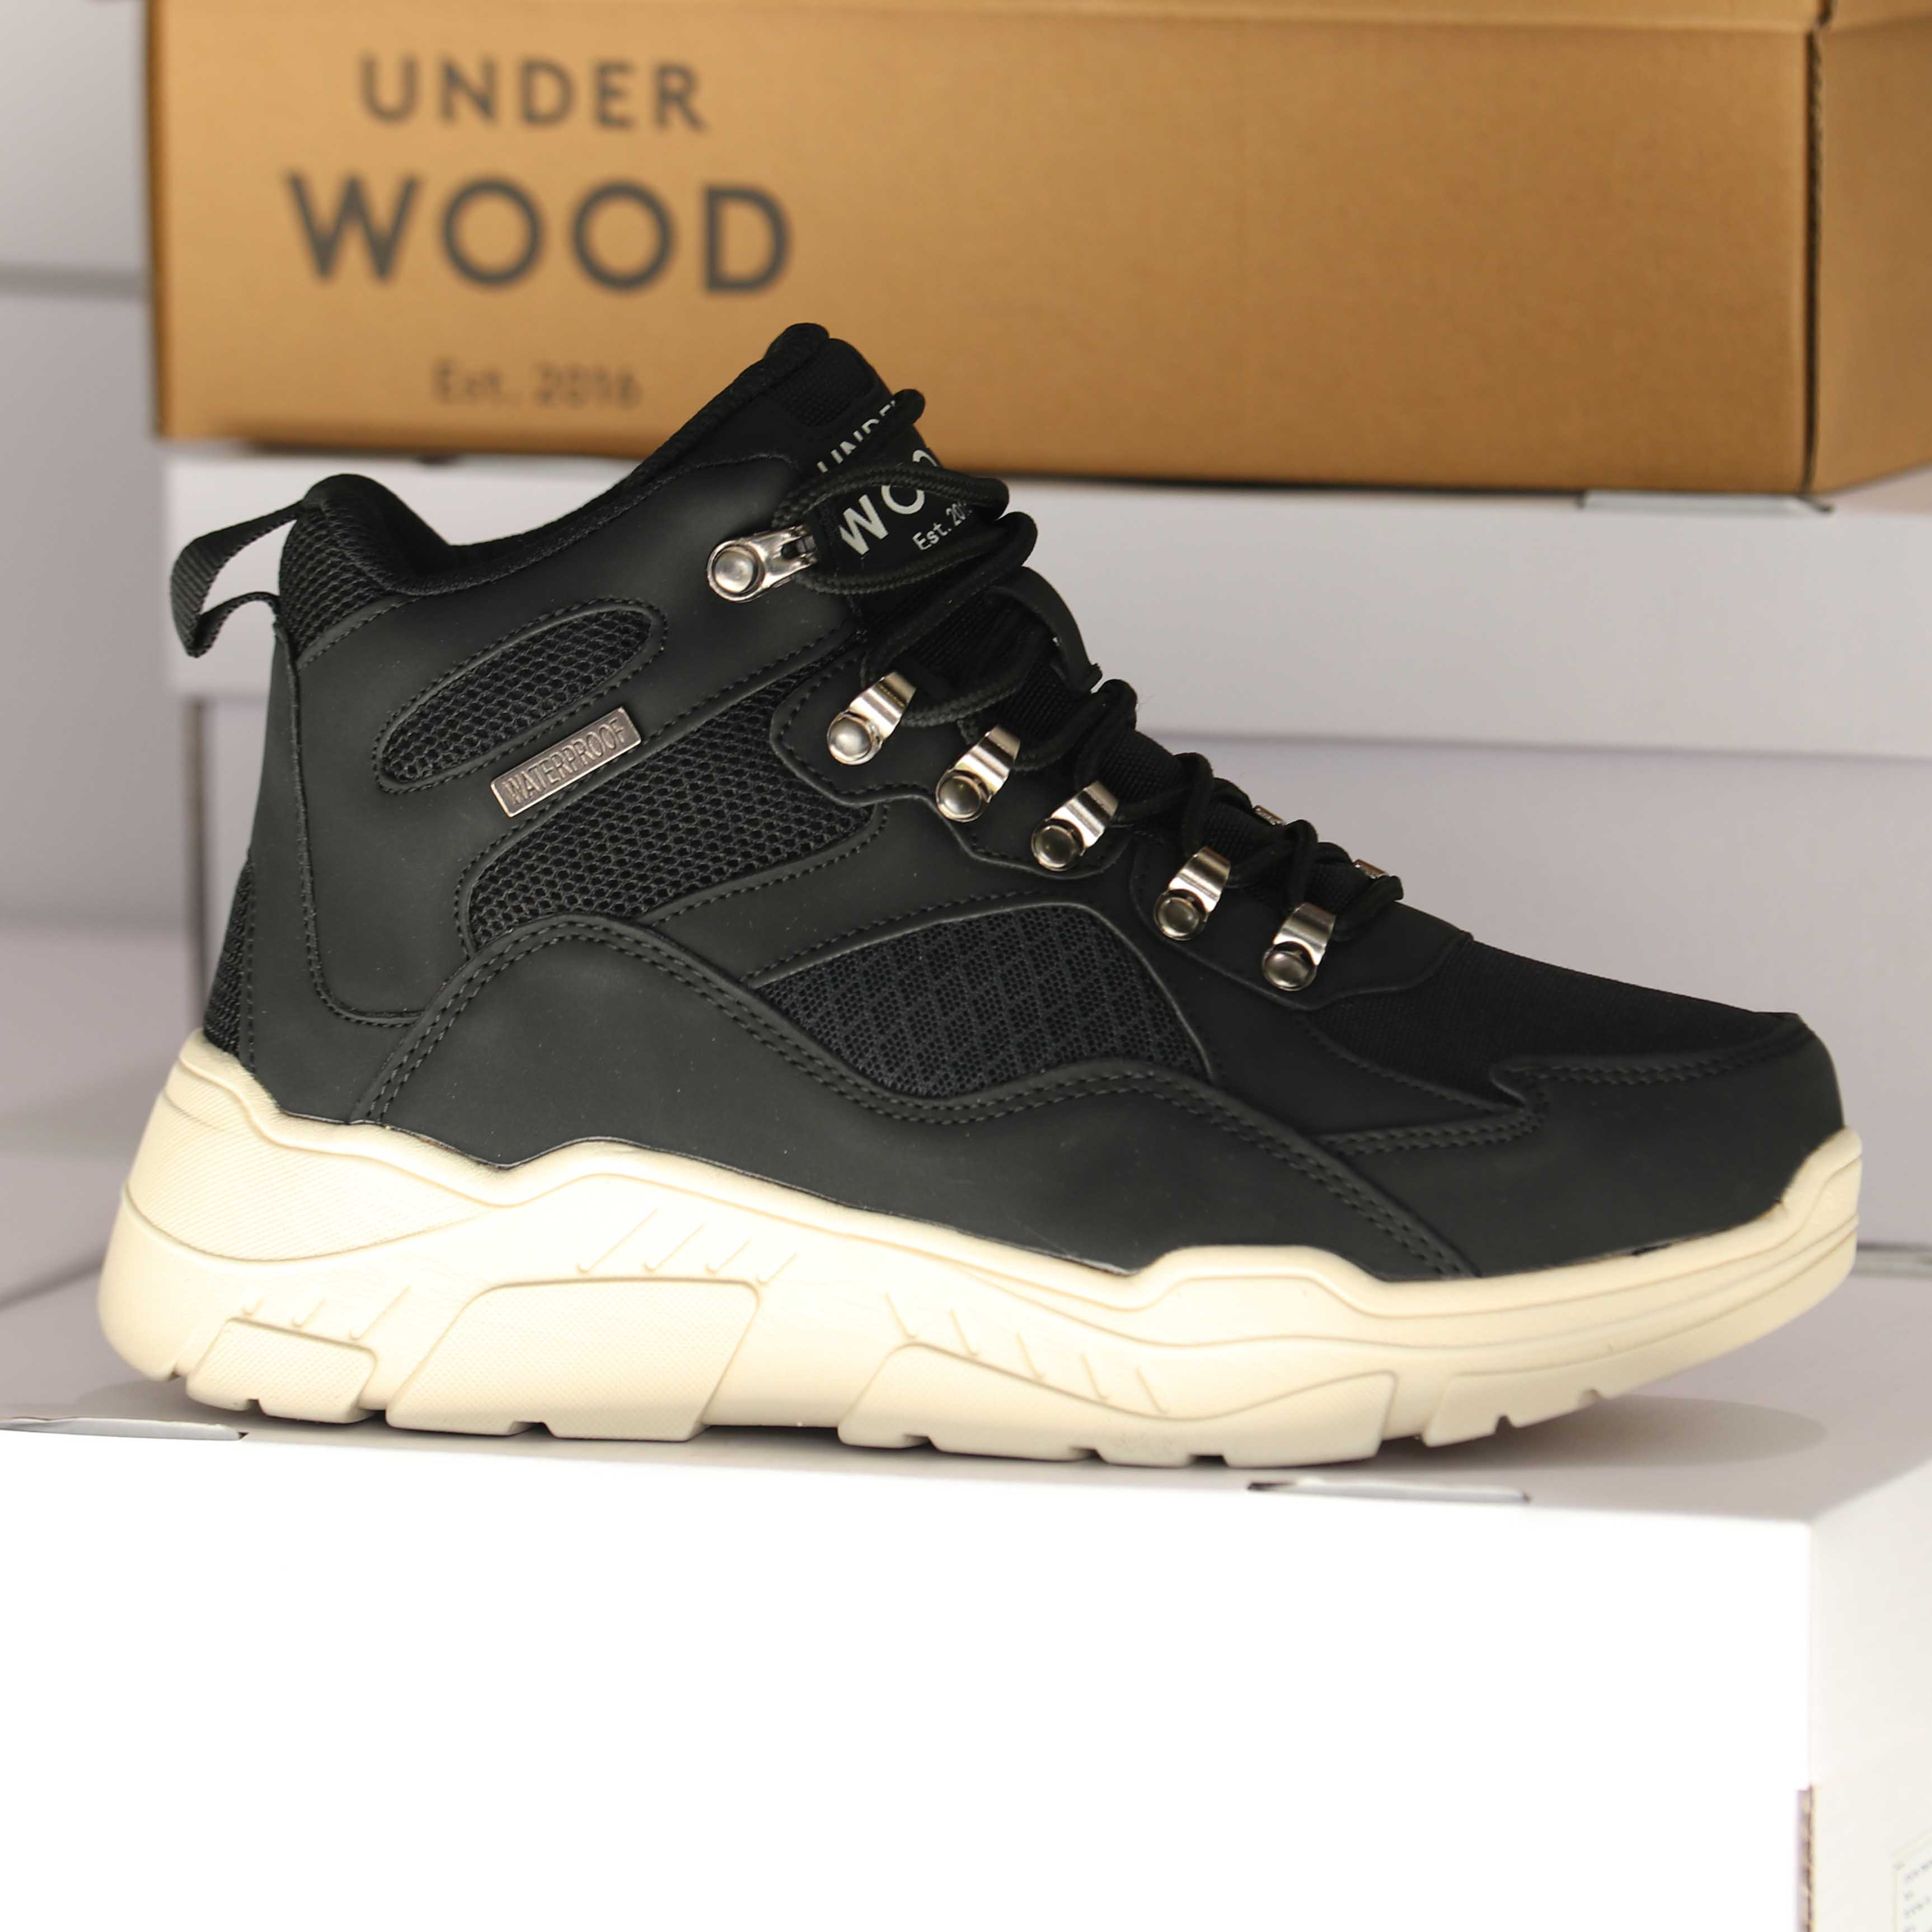 under wood – discovery black 25838 dame sko 5